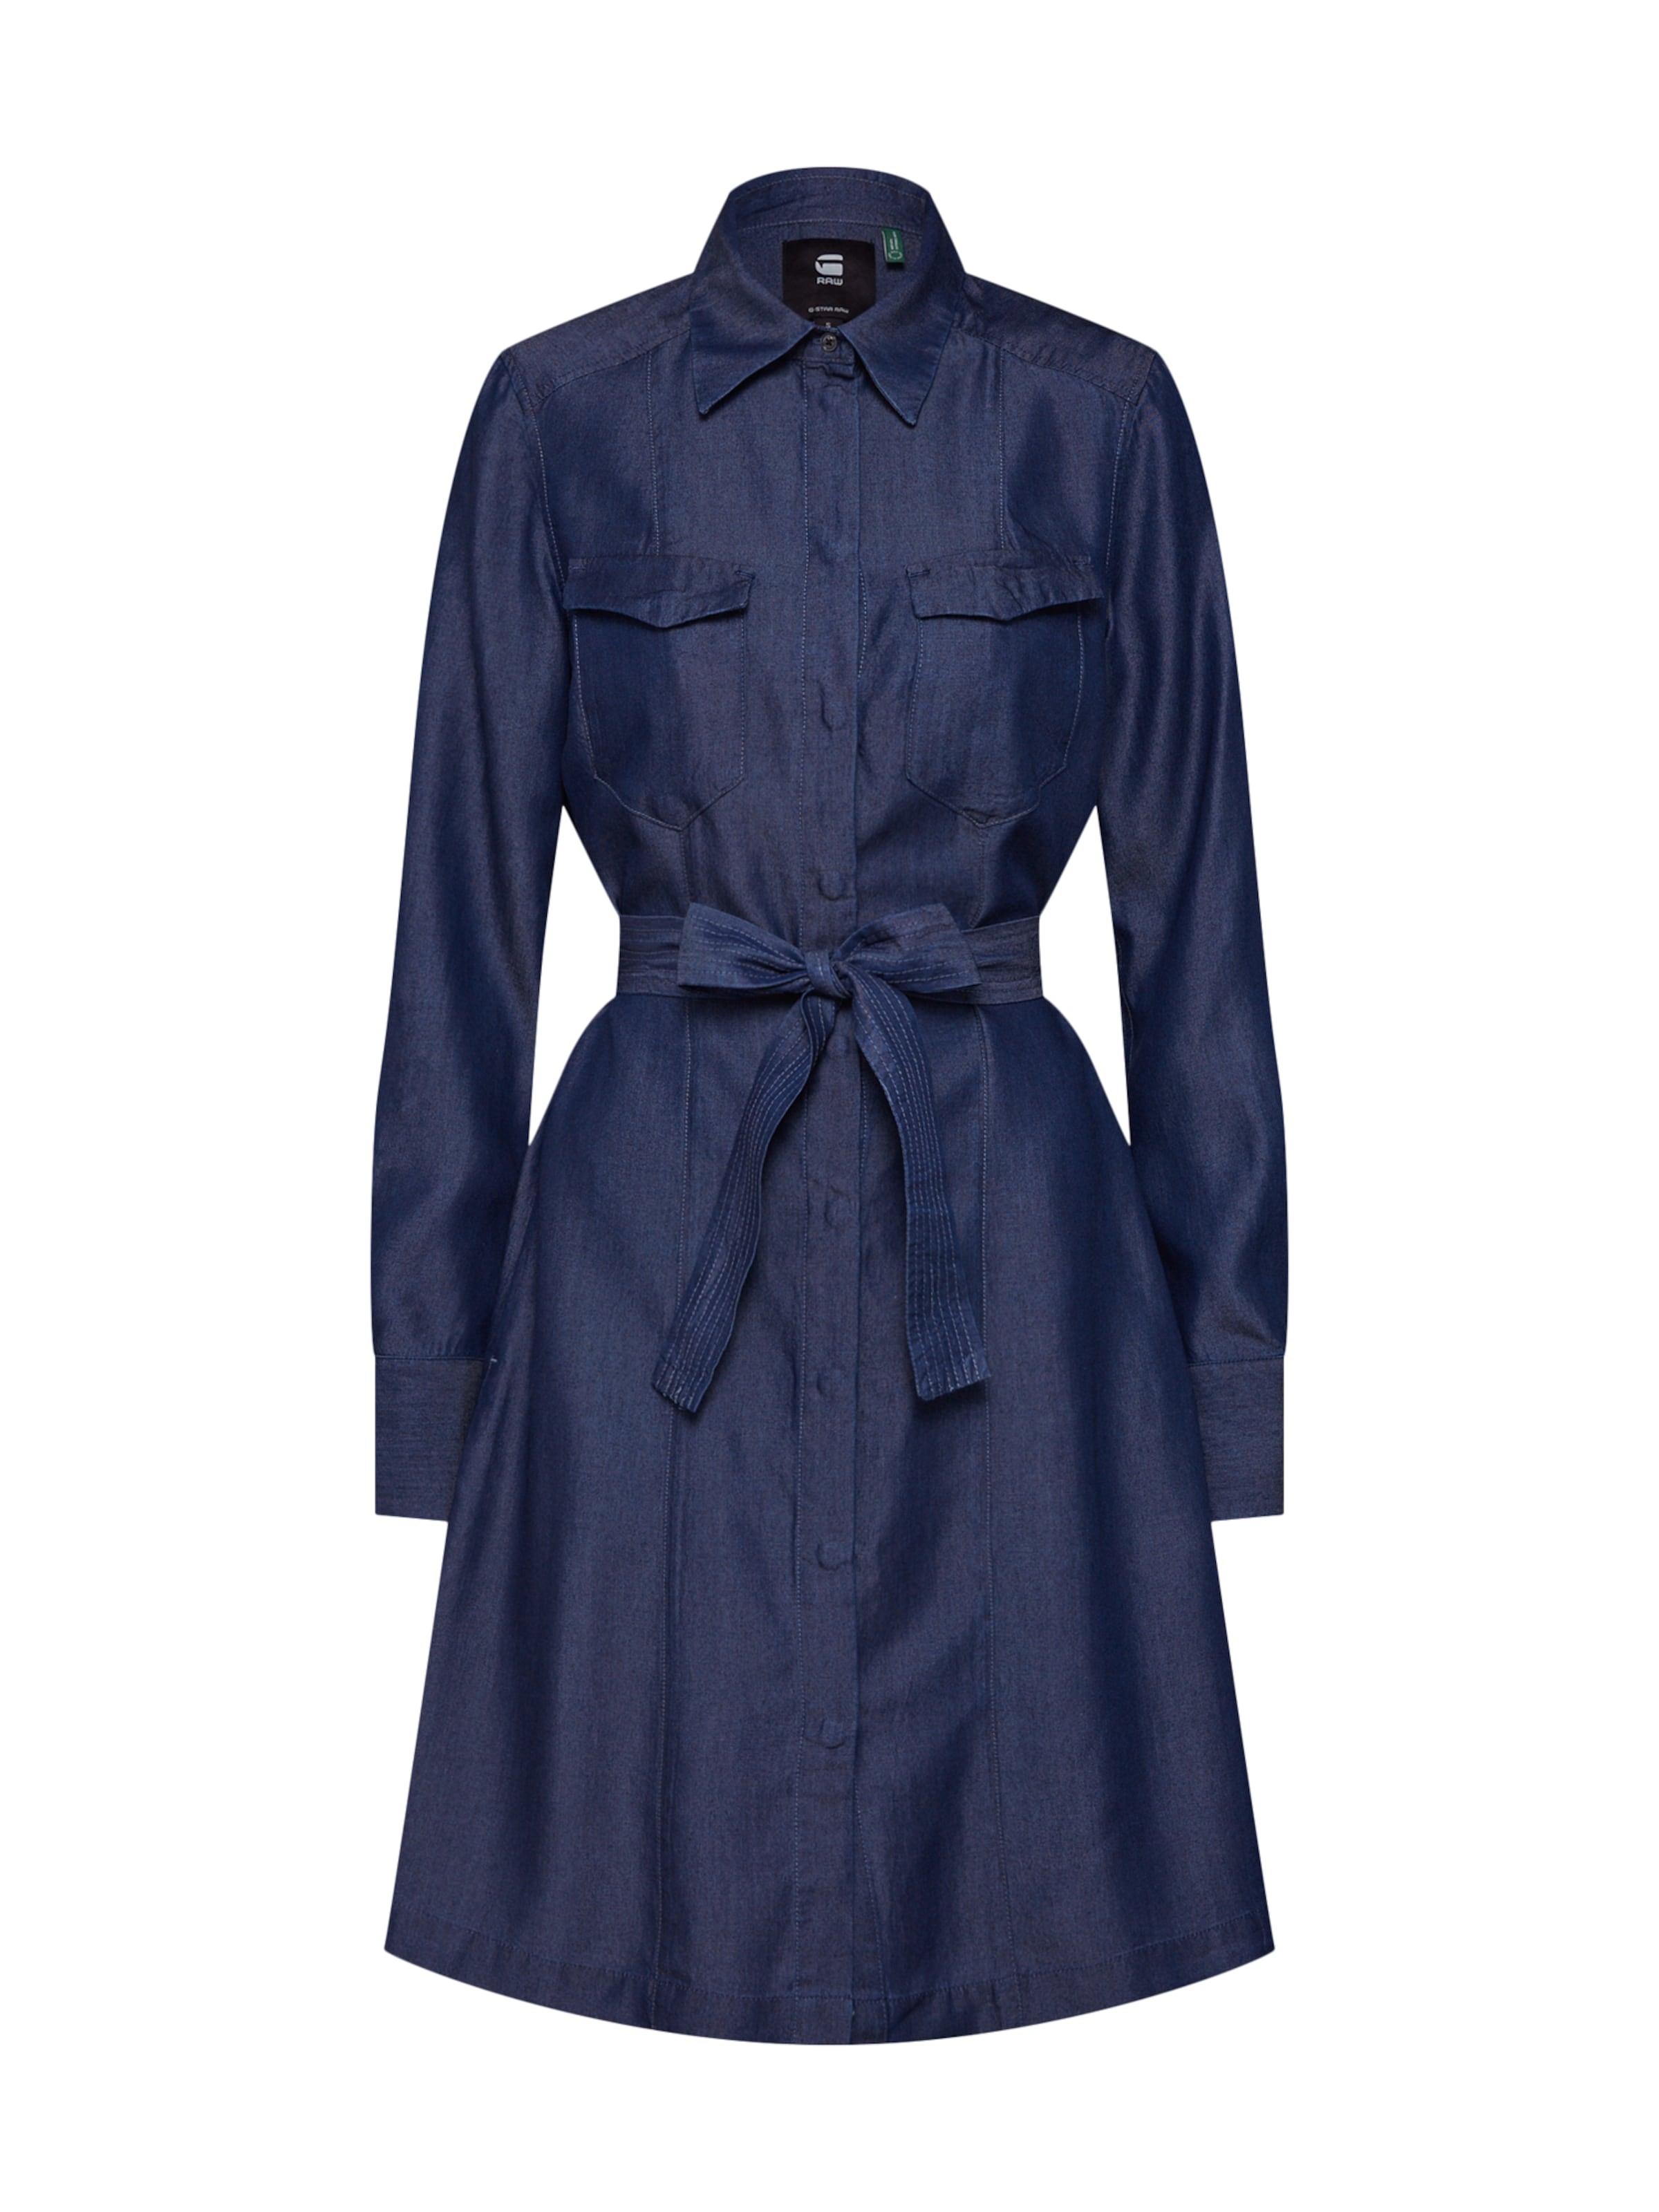 'tacoma' star Foncé G chemise En Robe Bleu Raw Omn0v8wN